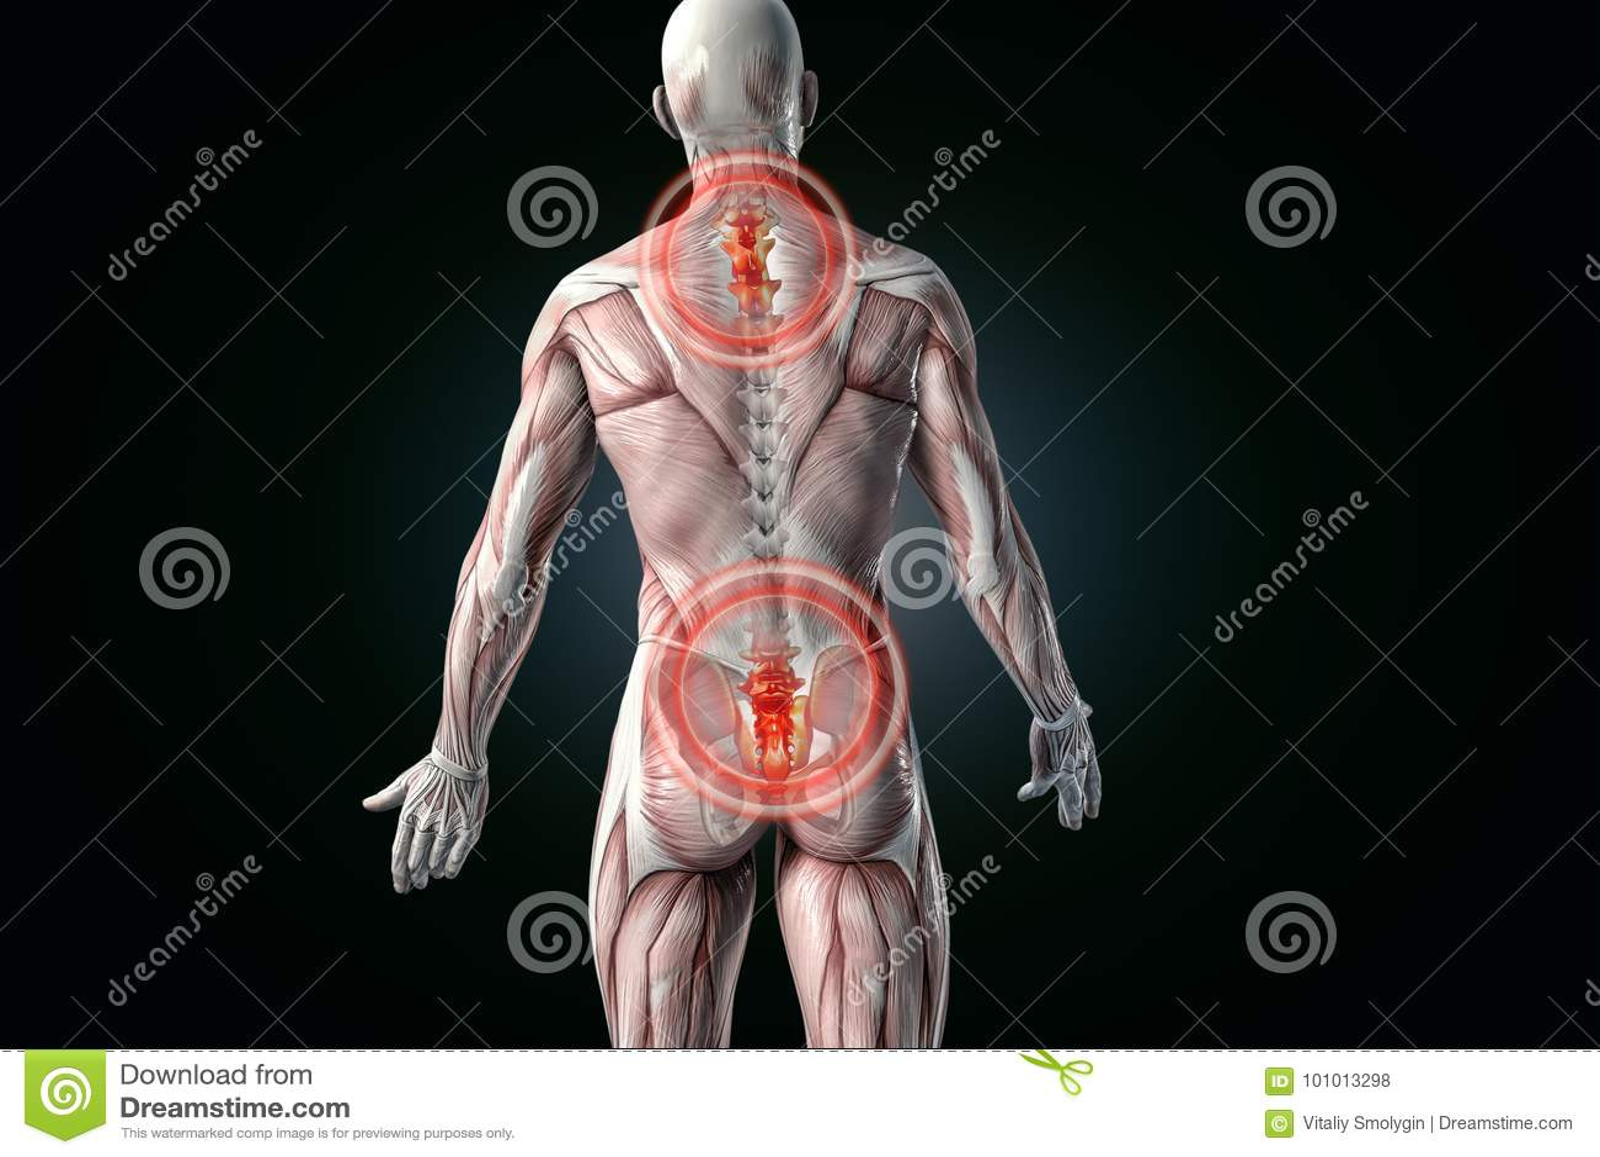 Anatomical Vision Back Pain. Lower Back Pain. Stock Illustration ...